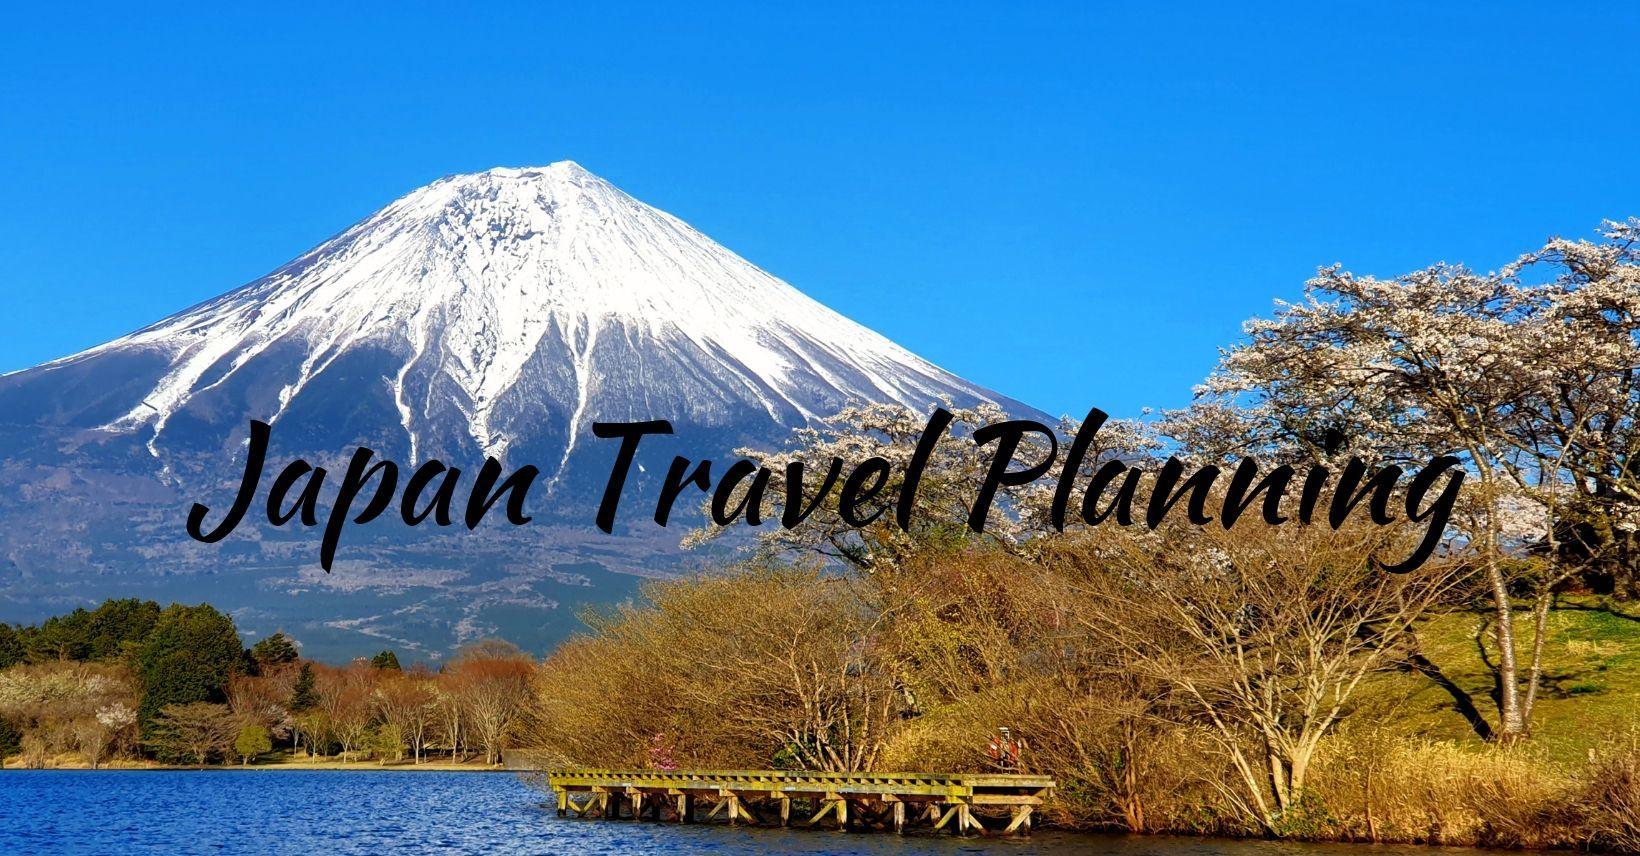 Japan Travel Planning Facebook Group